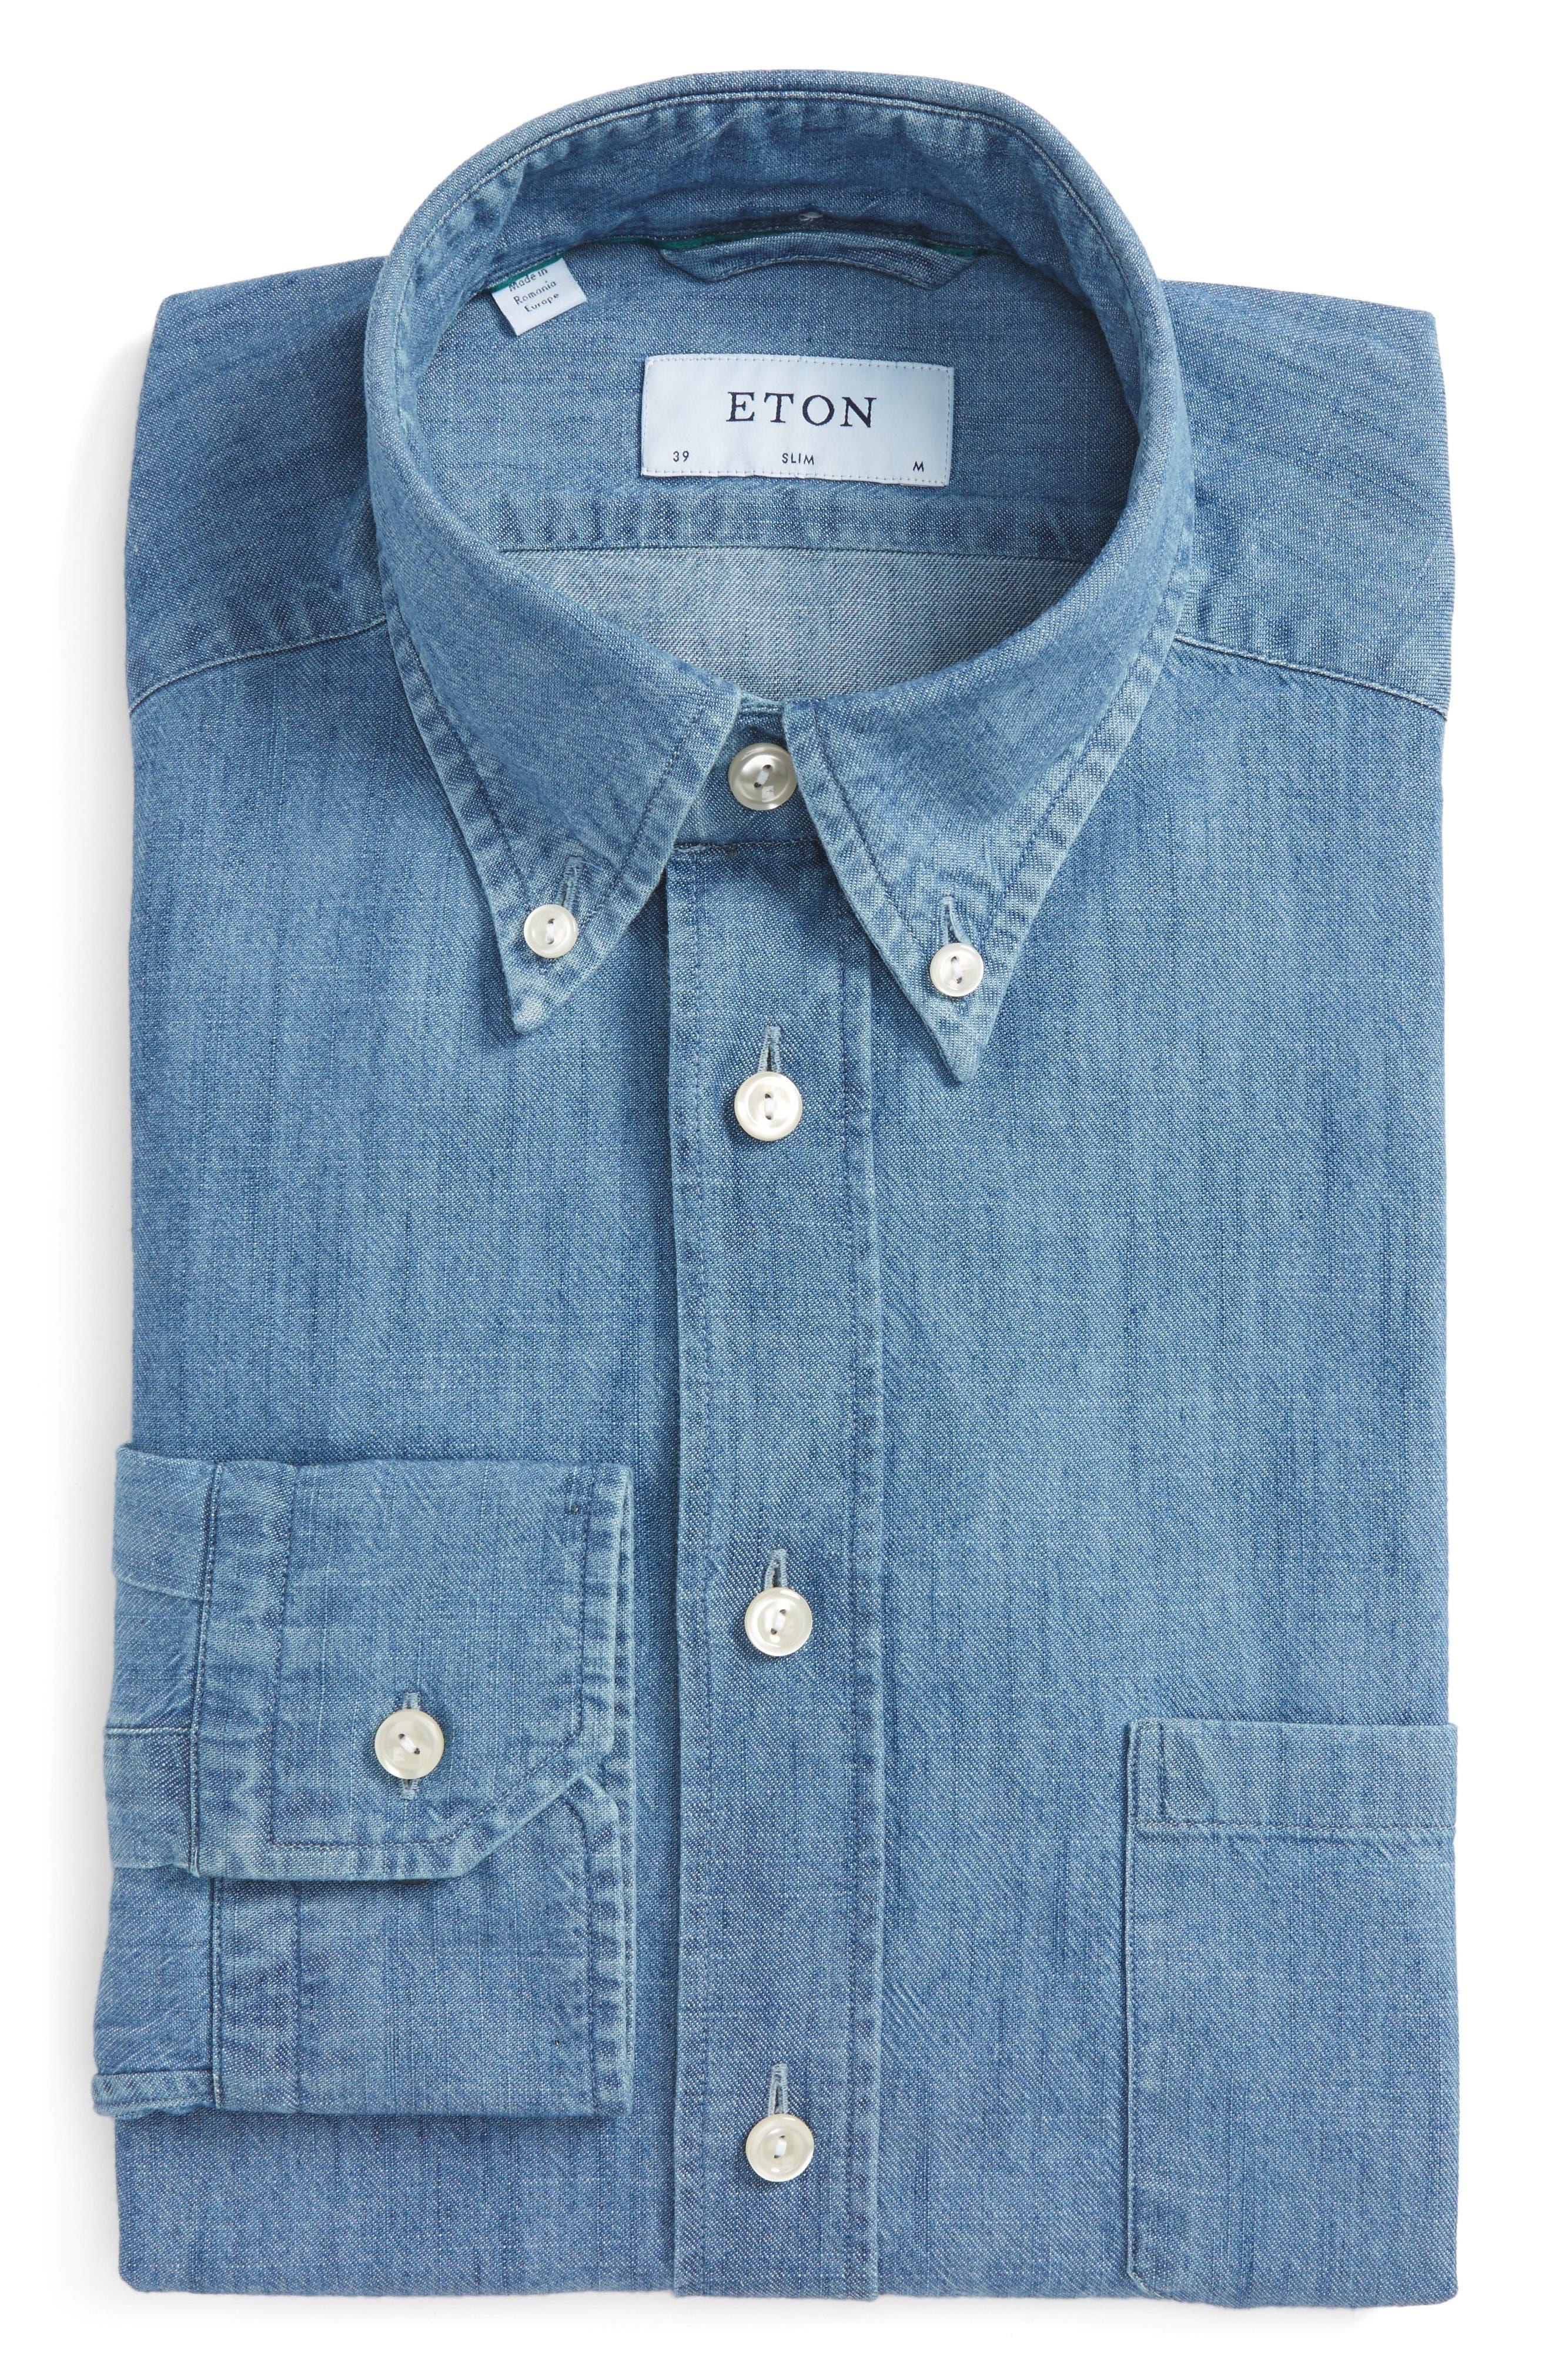 Alternate Image 1 Selected - Eton Slim Fit Chambray Dress Shirt